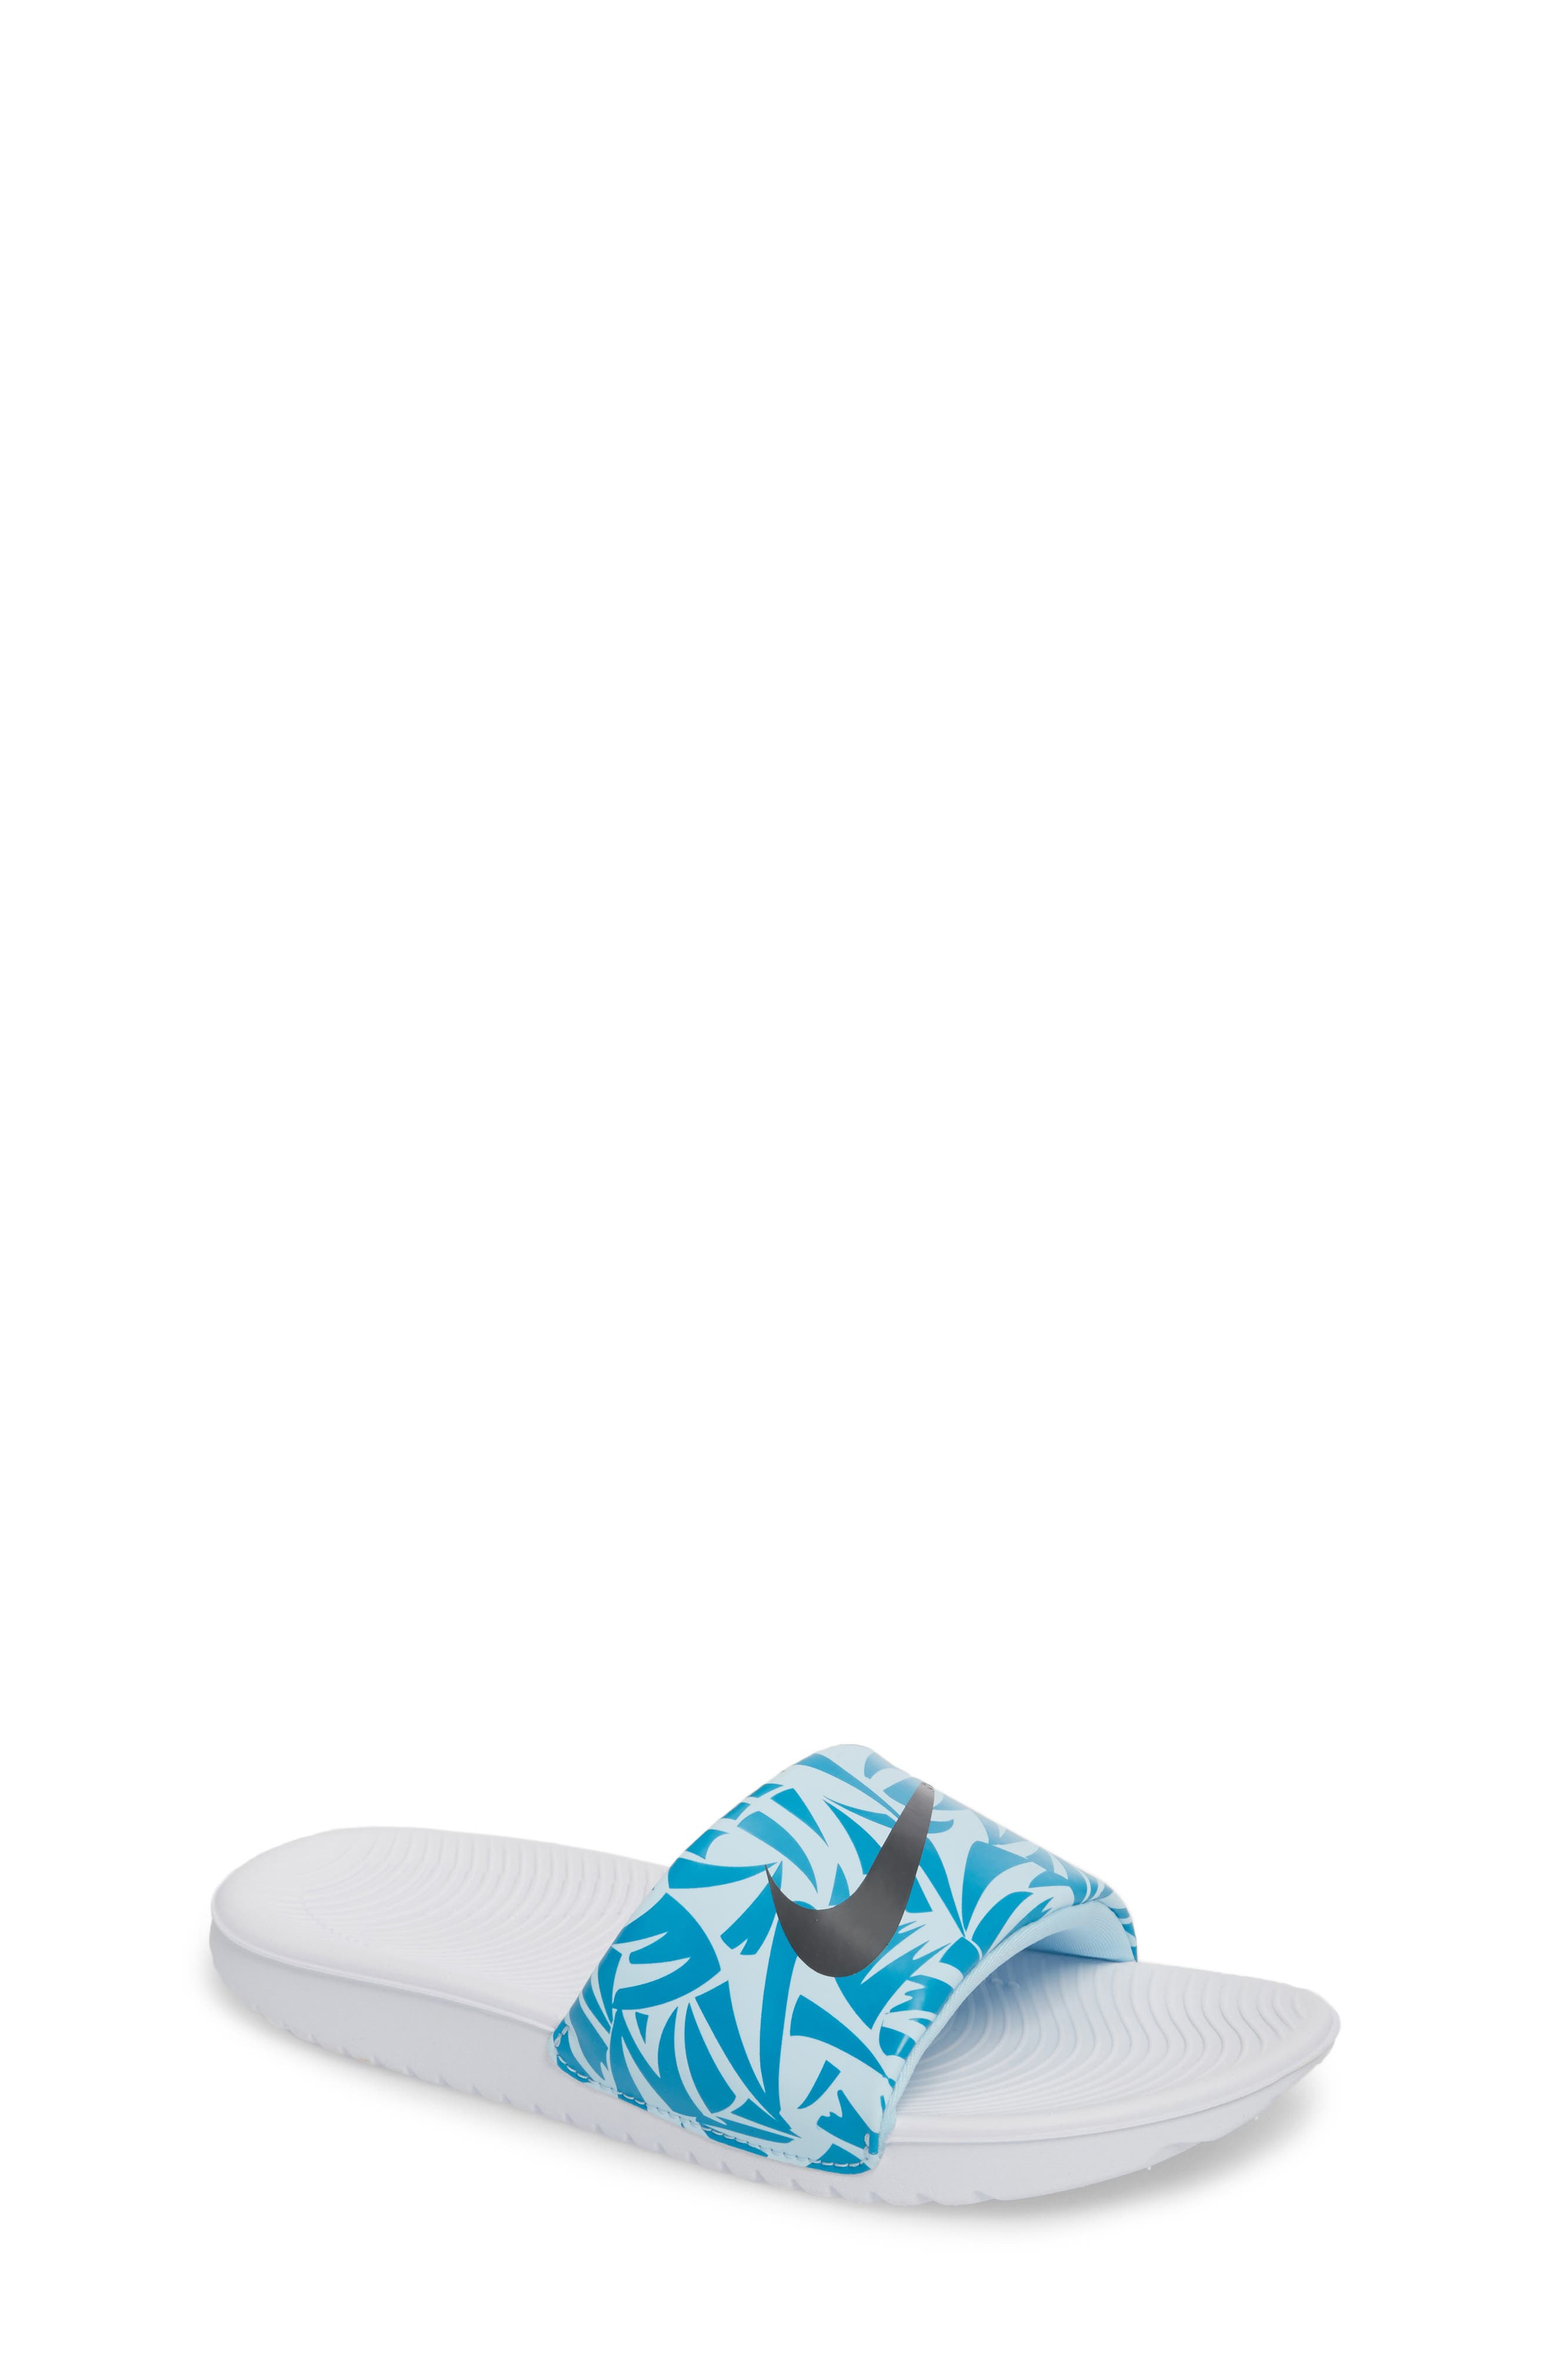 'Kawa' Print Slide Sandal,                             Main thumbnail 1, color,                             White/ Anthracite/ Turquoise